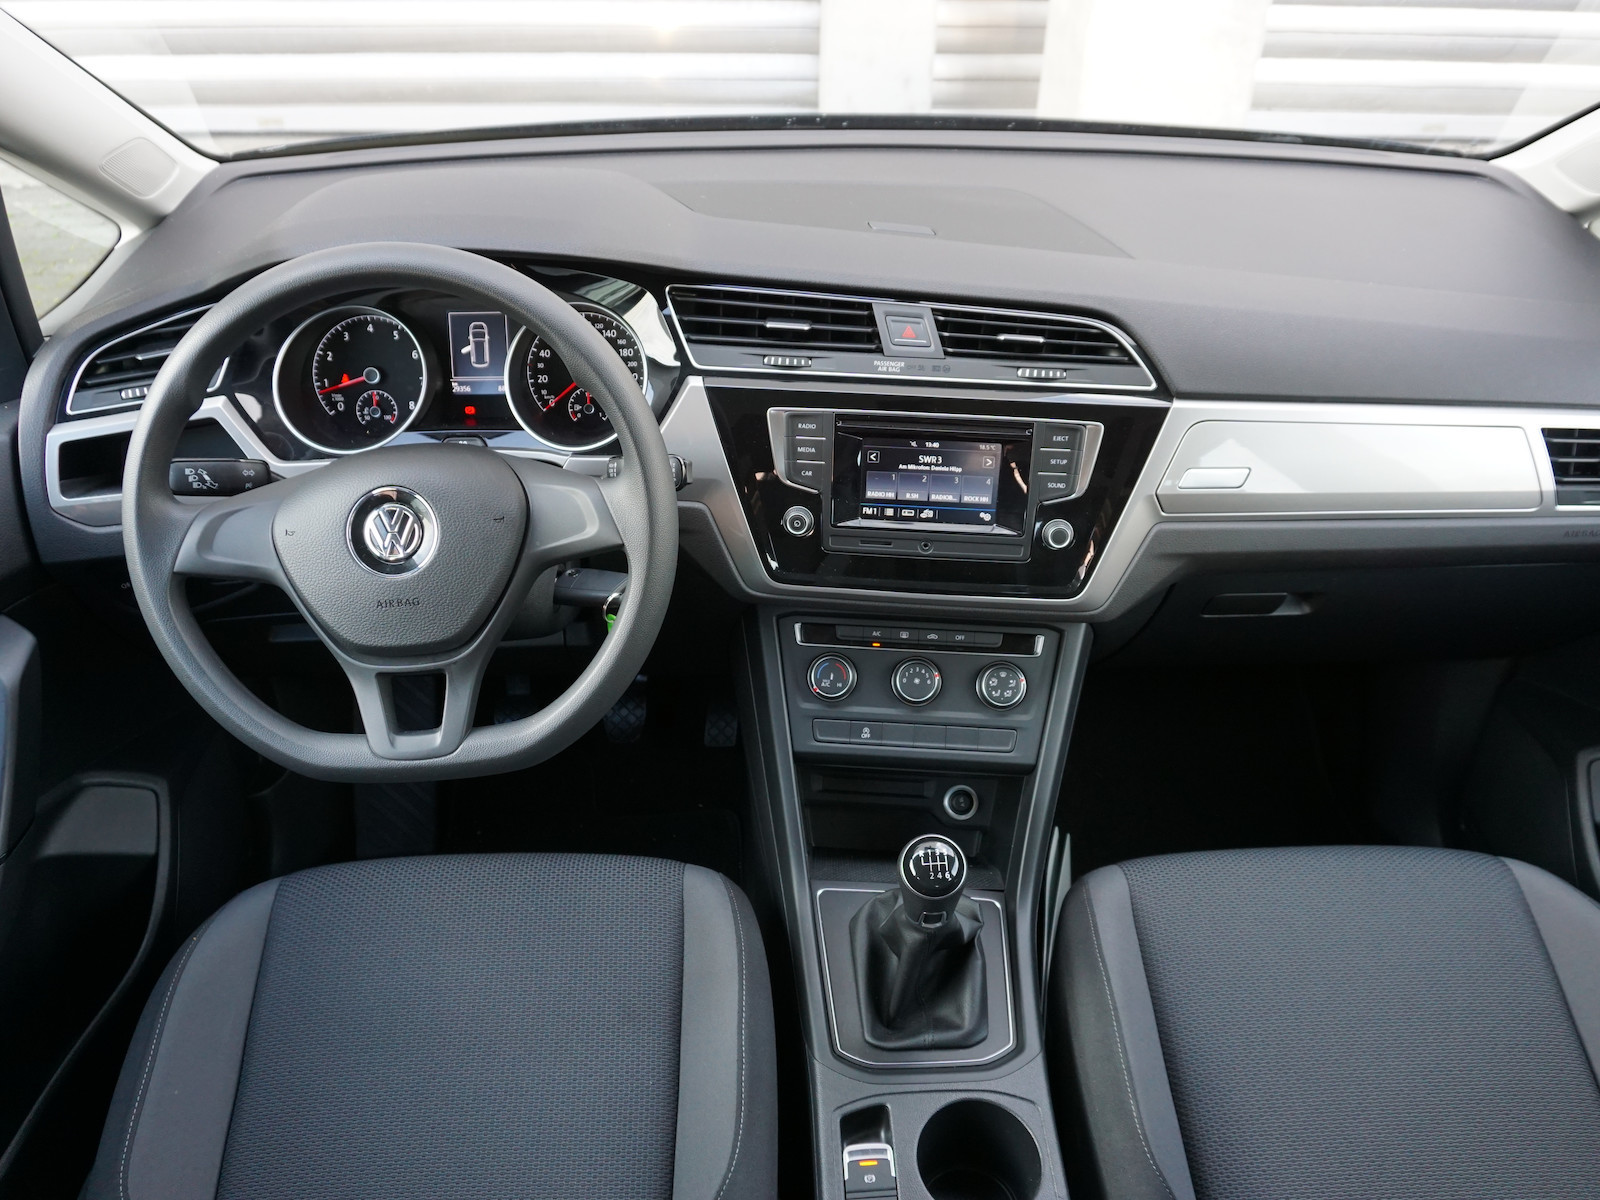 VW_Touran__4